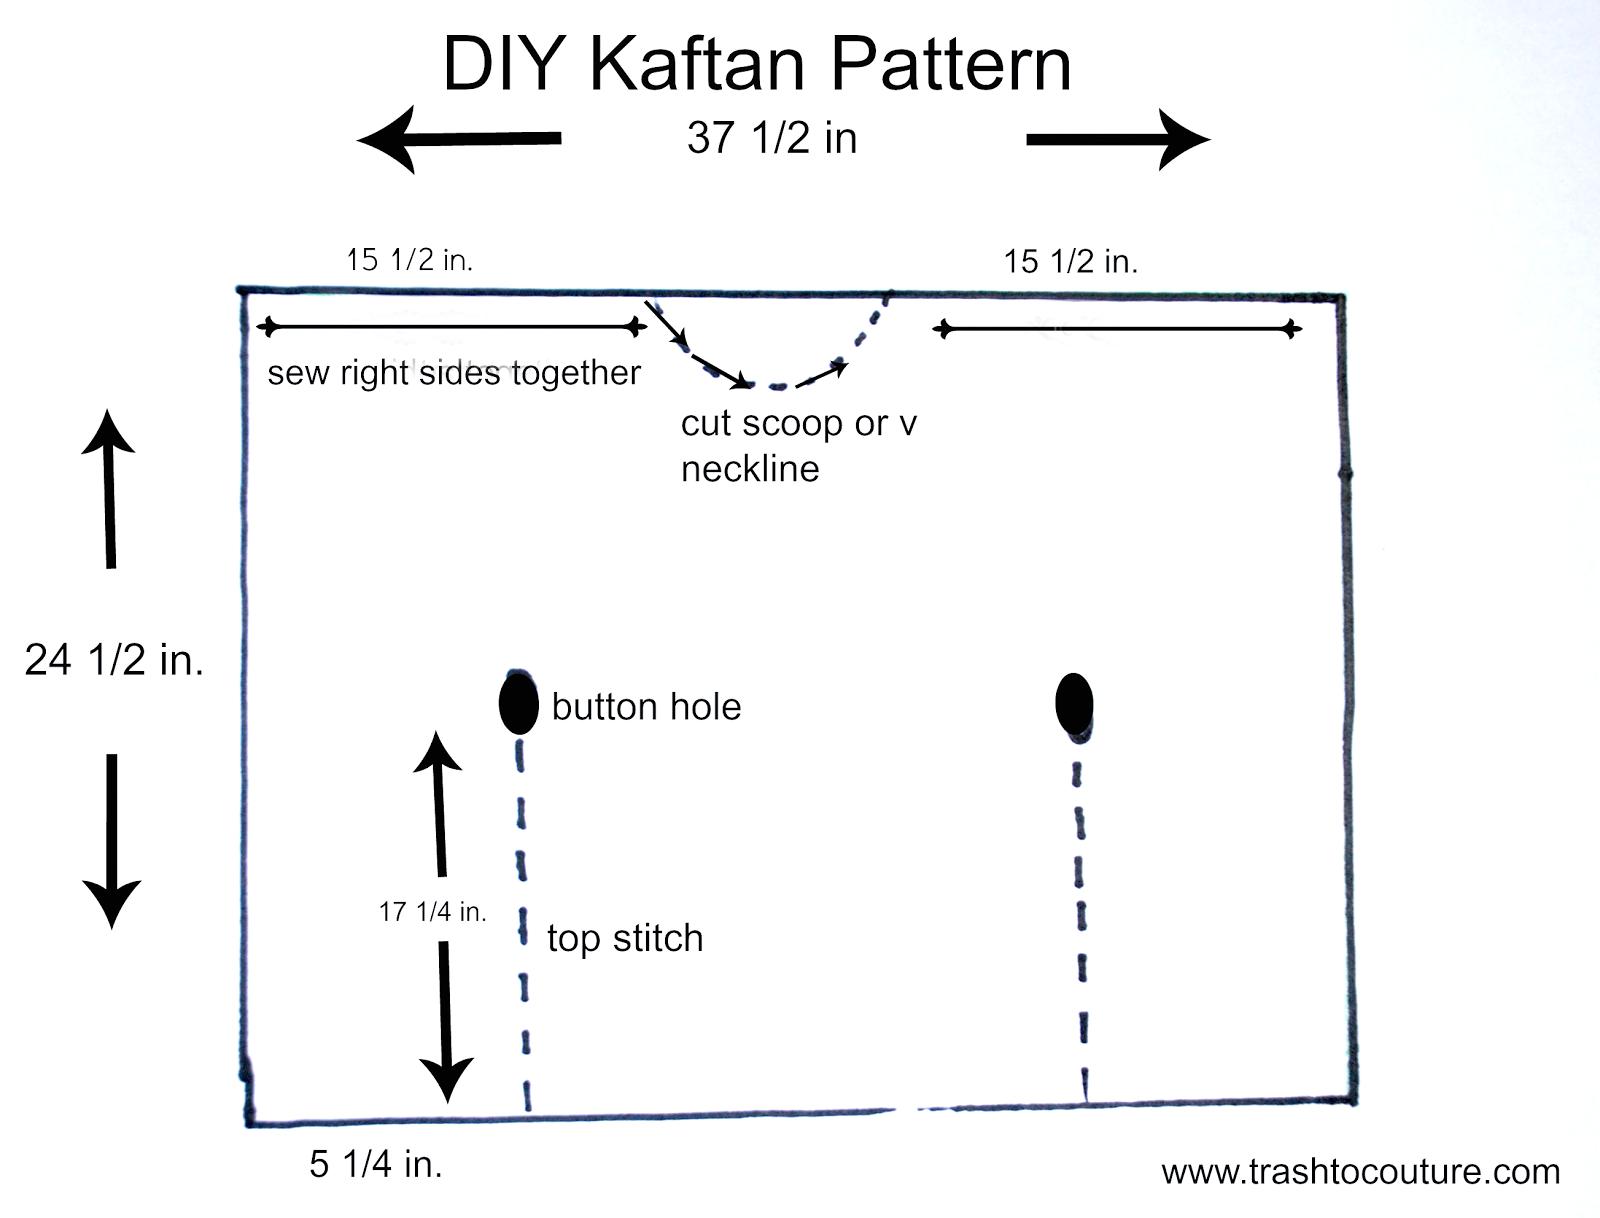 DIY Kaftan pattern | Diy nähen und Nähen